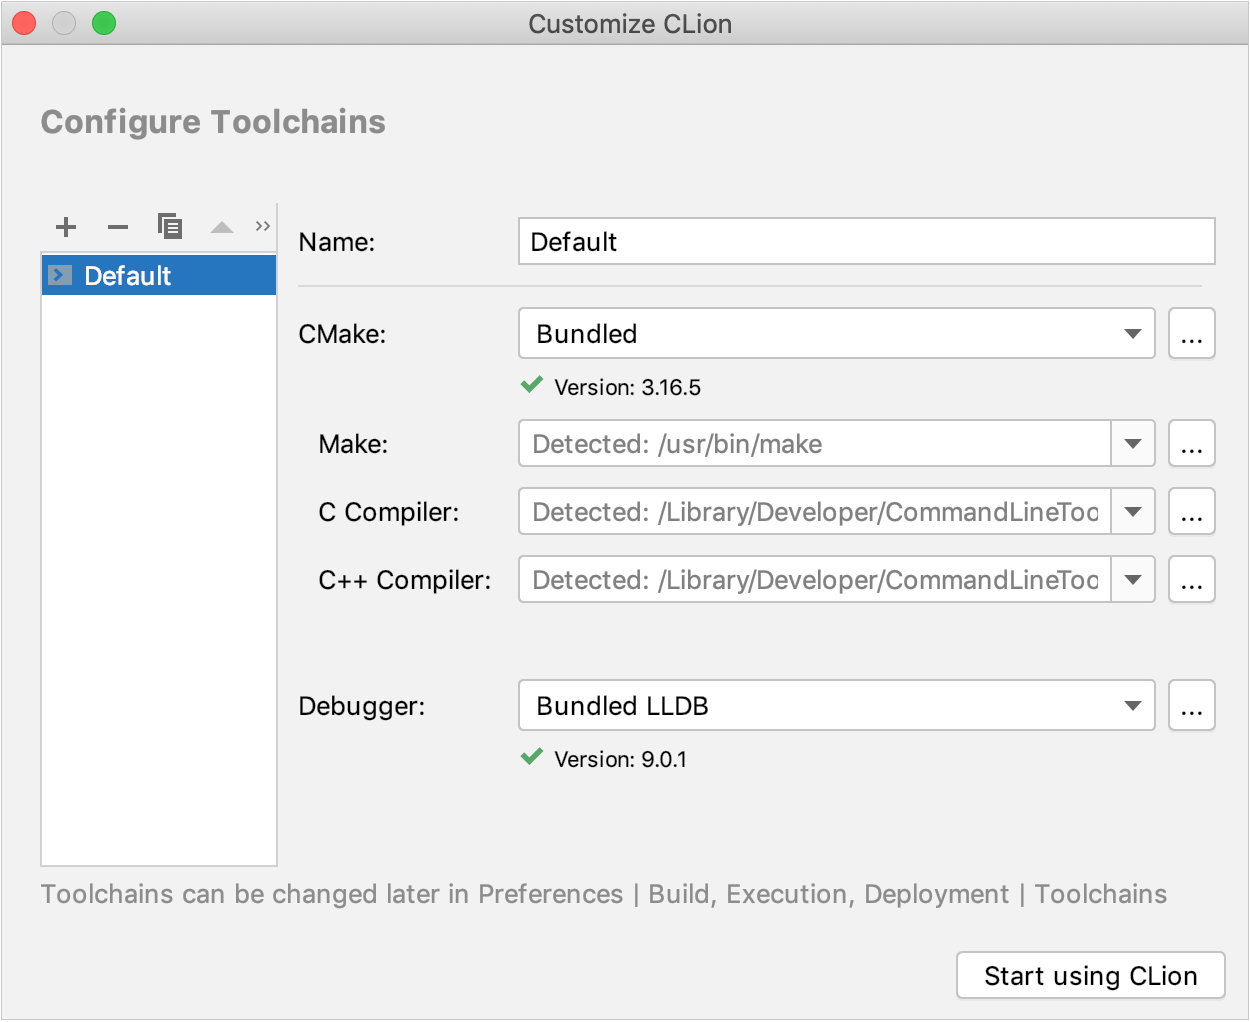 Configure toolchain on the first run